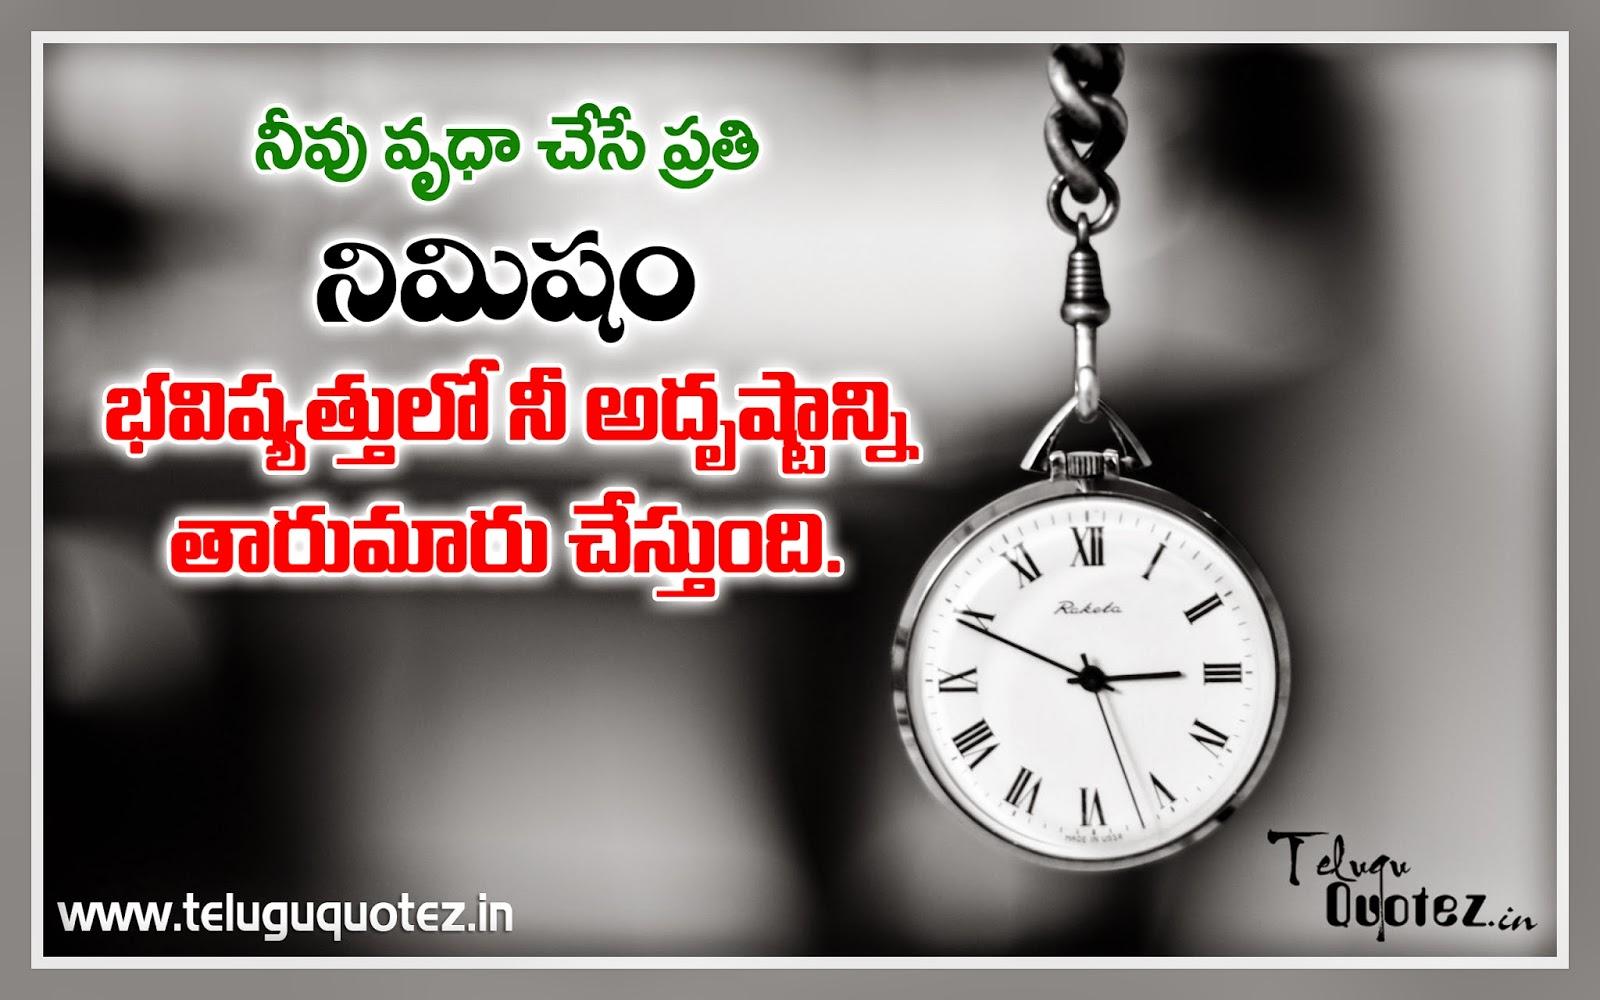 Telugu Quotes On Life Naveengfx